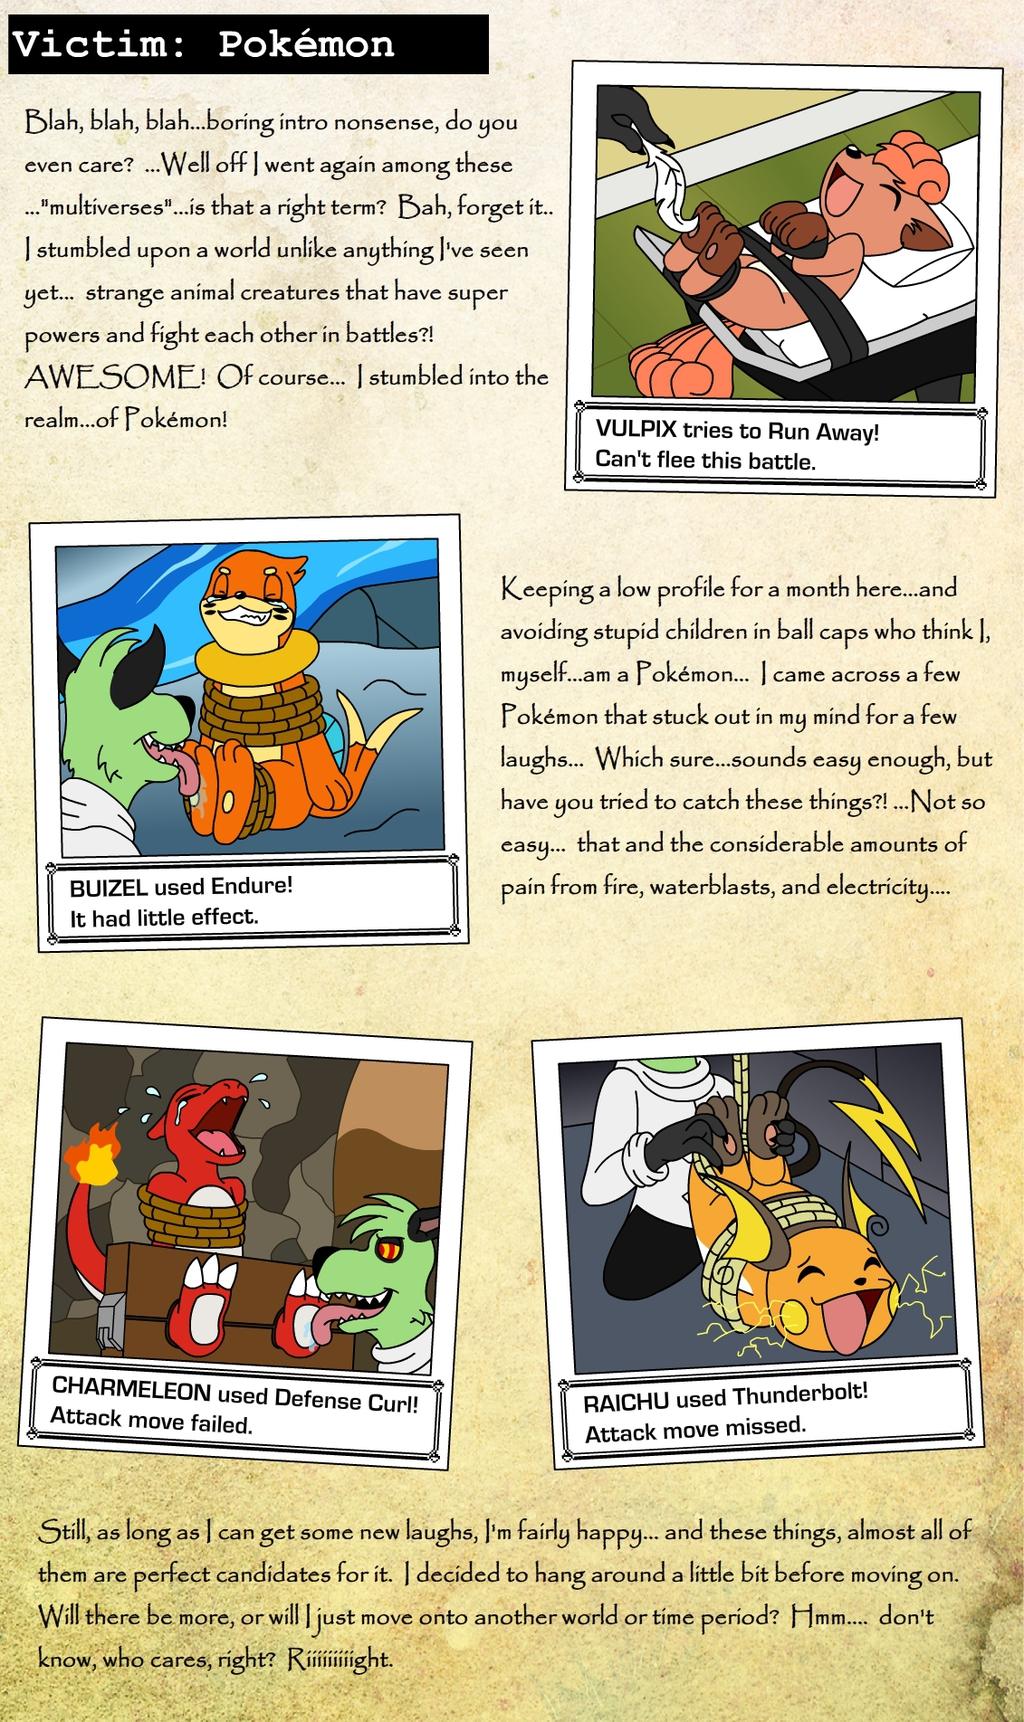 Victim 13: Pokémon